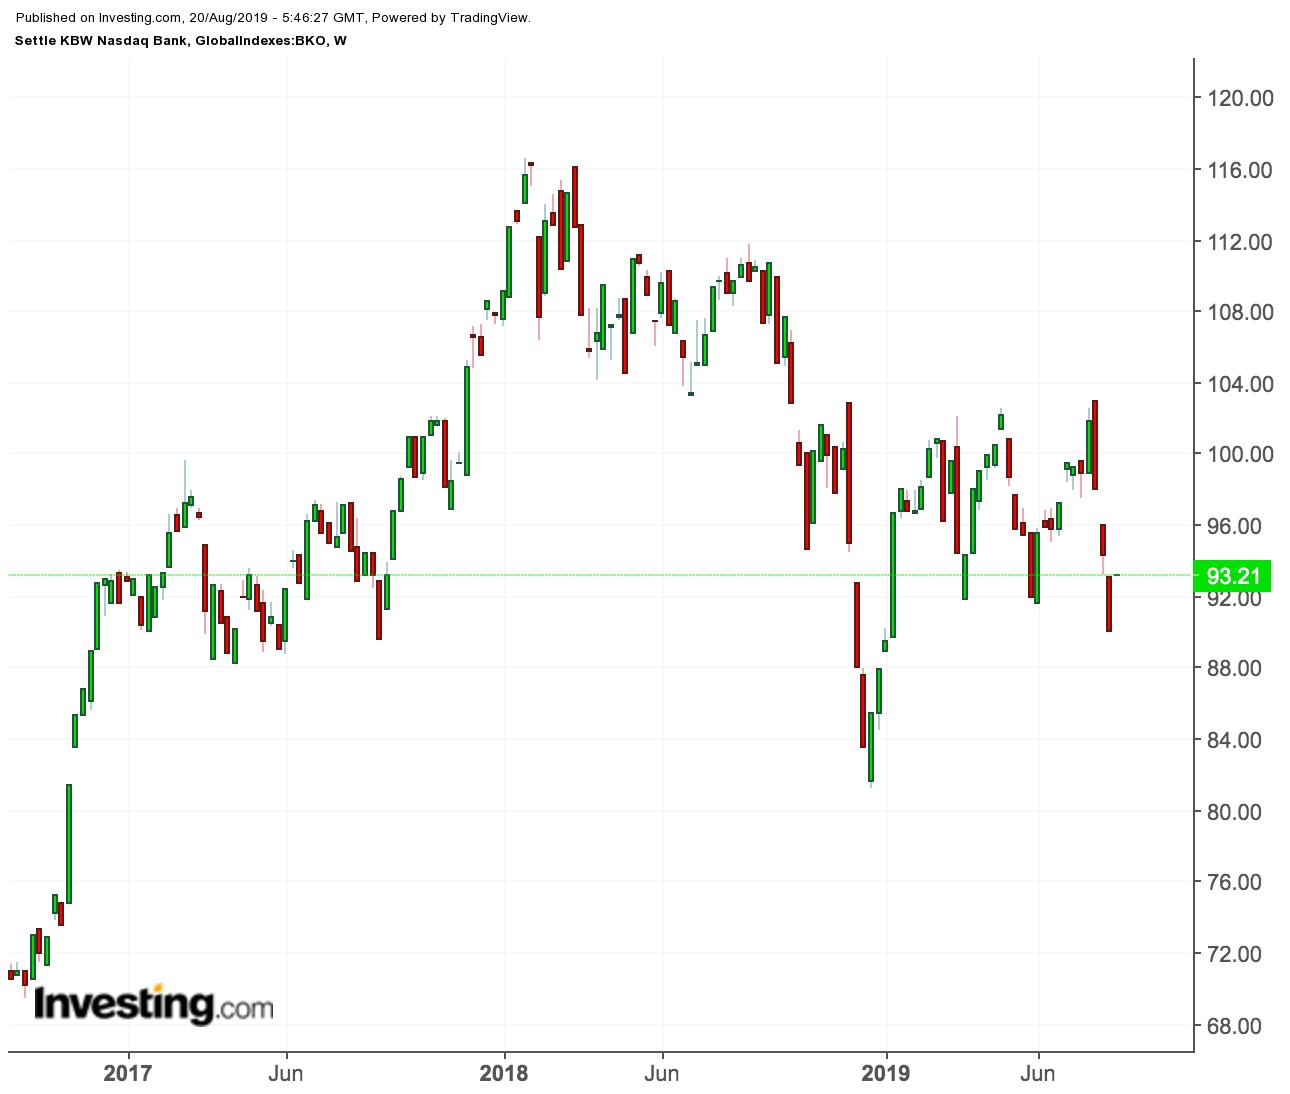 KBW NASDAQ Bank Industry Index